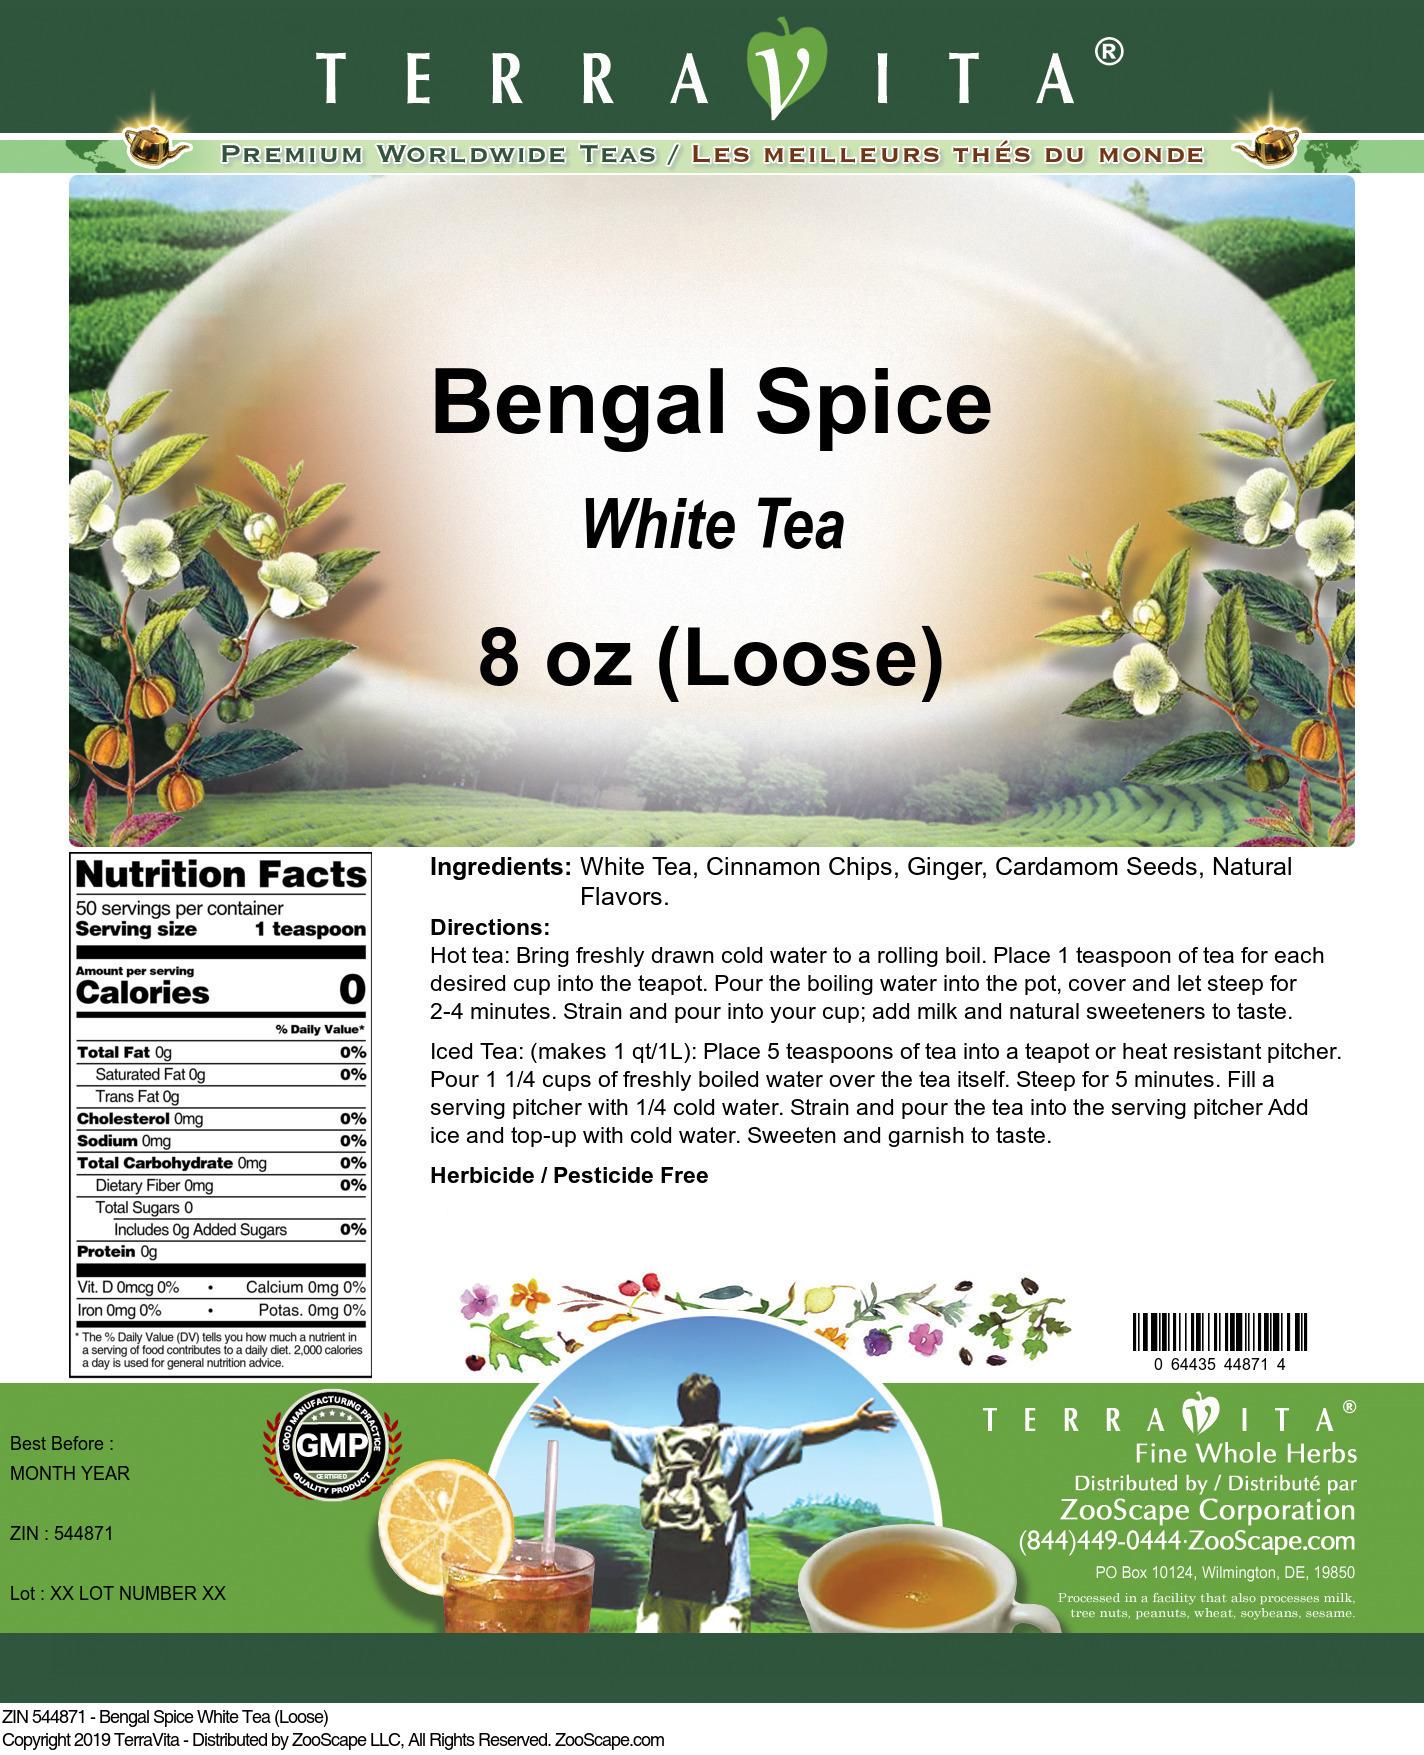 Bengal Spice White Tea (Loose)